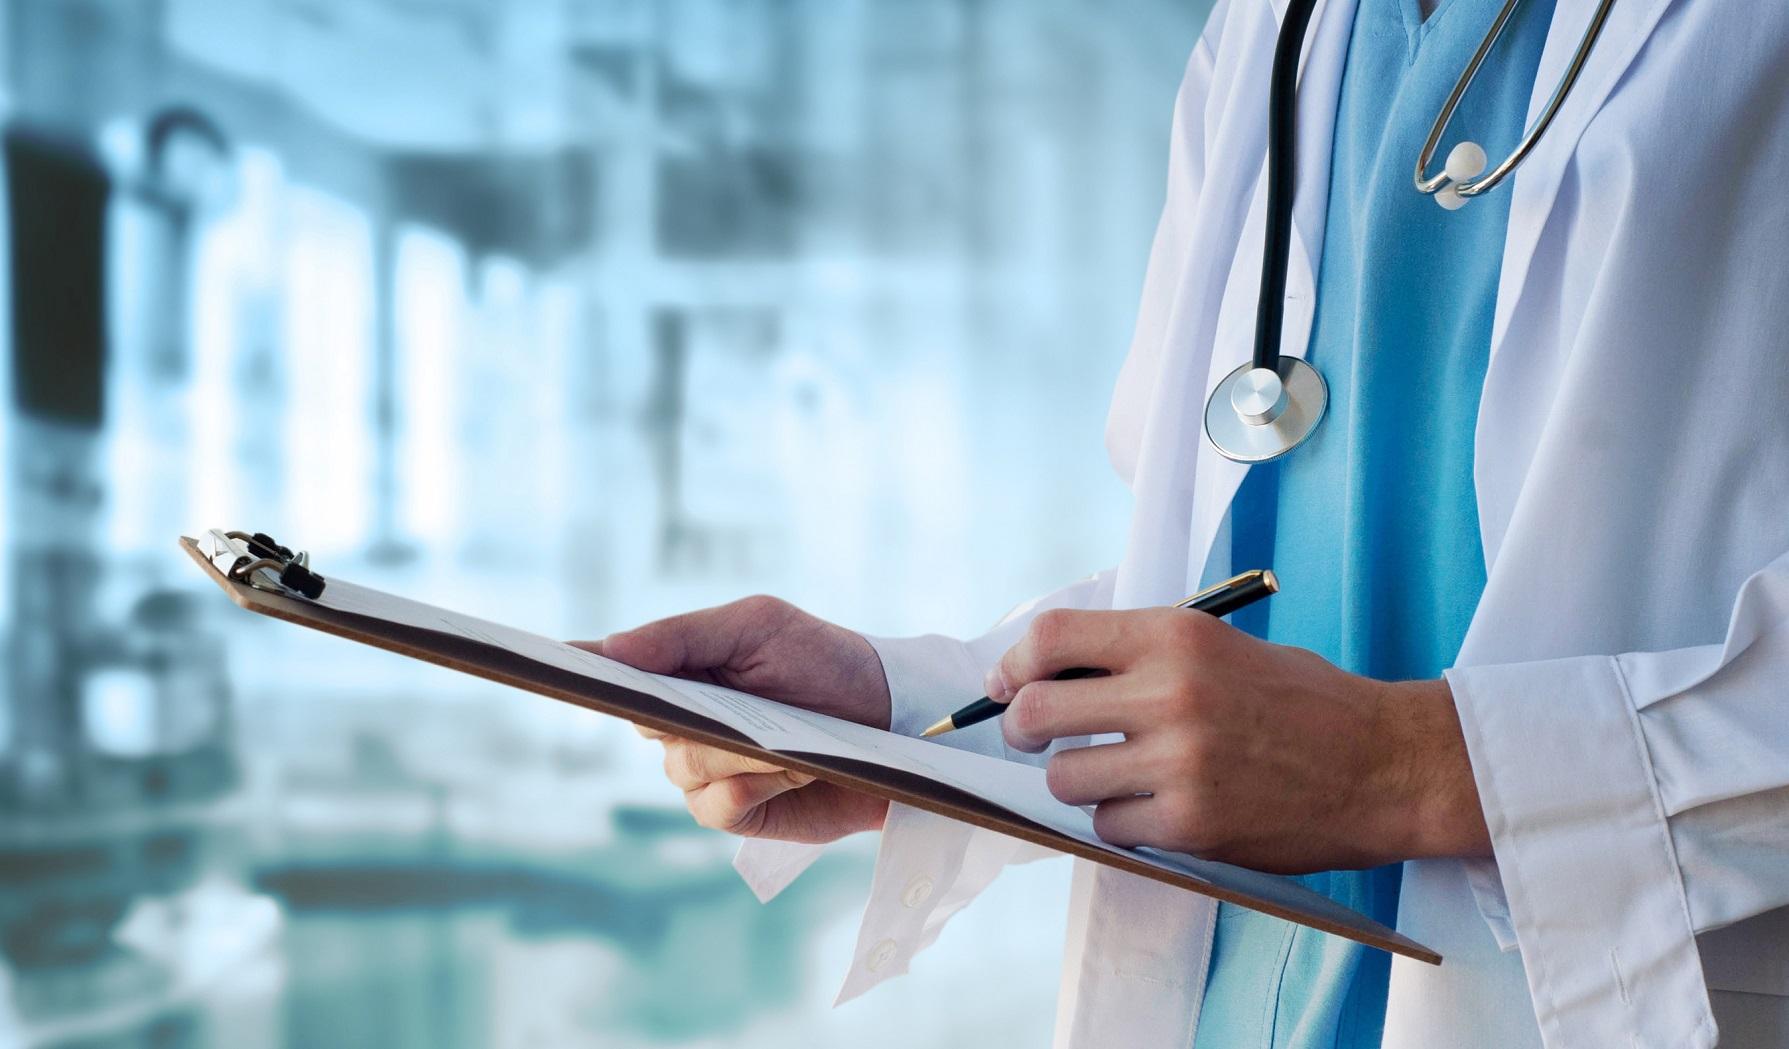 What Is Endometritis? Symptoms, Causes & Treatment